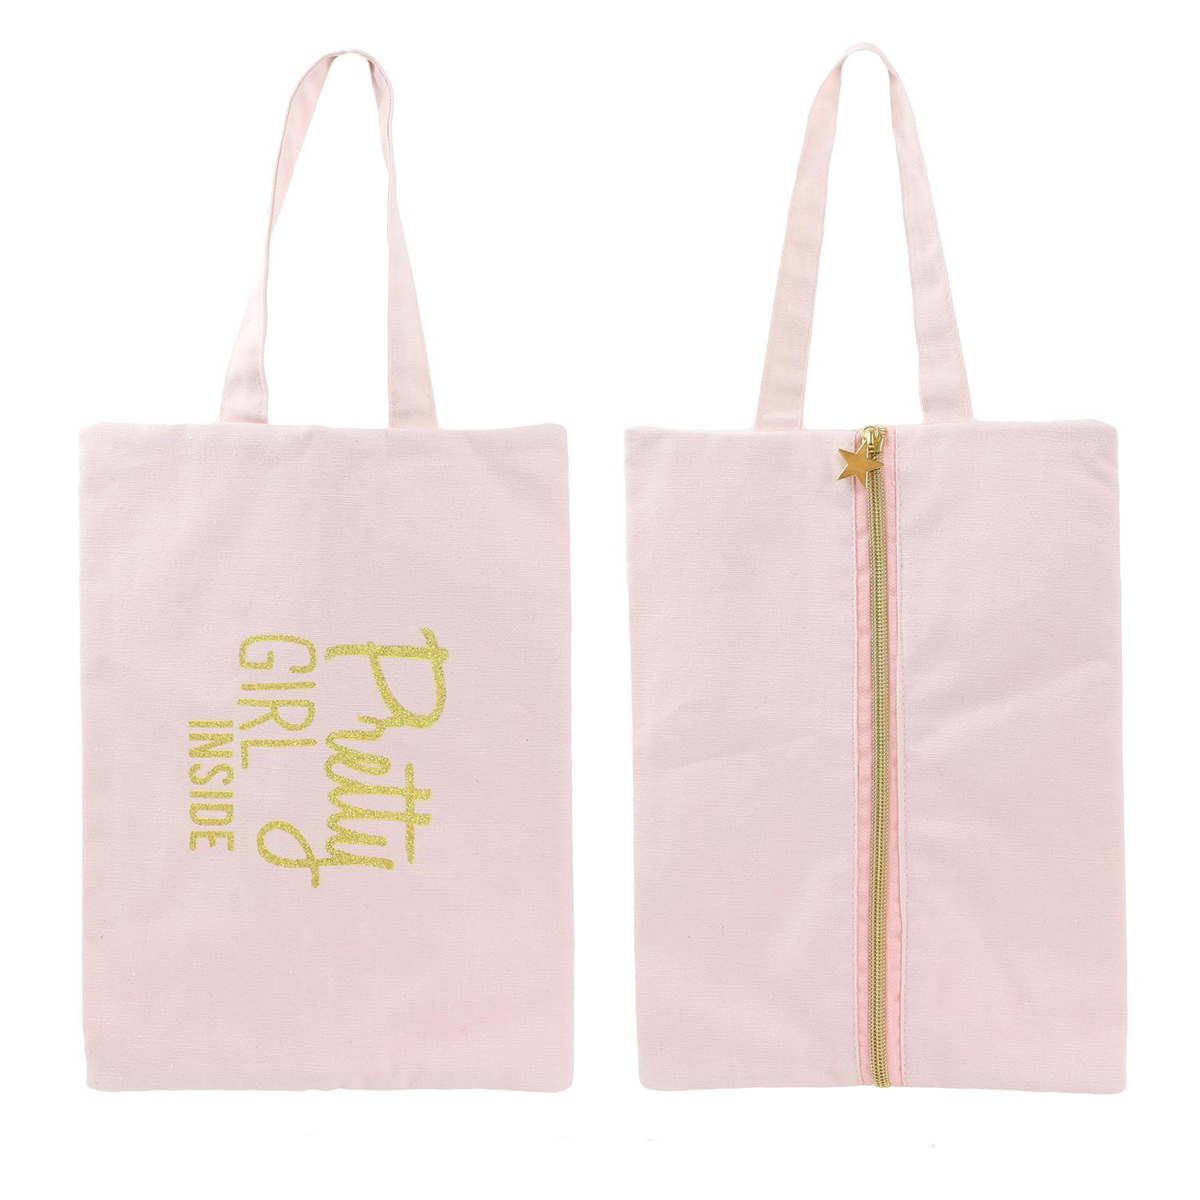 Pochette plate / sac à chaussures coton \'Messages\' rose (Pretty girl inside) - 30x21 cm - [Q3925]